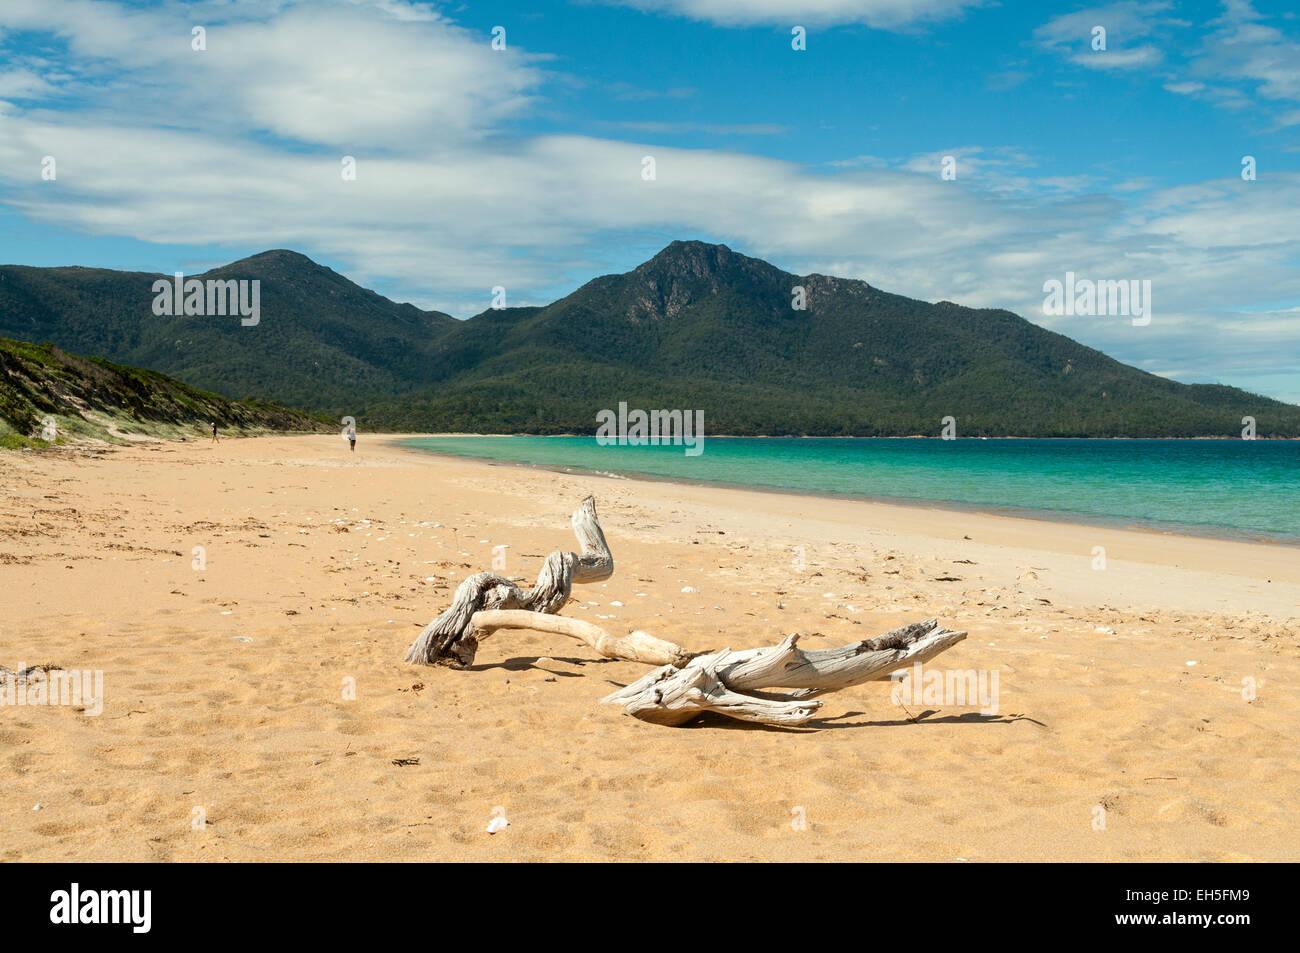 Hazards Beach, Freycinet NP, Tasmania, Australia - Stock Image